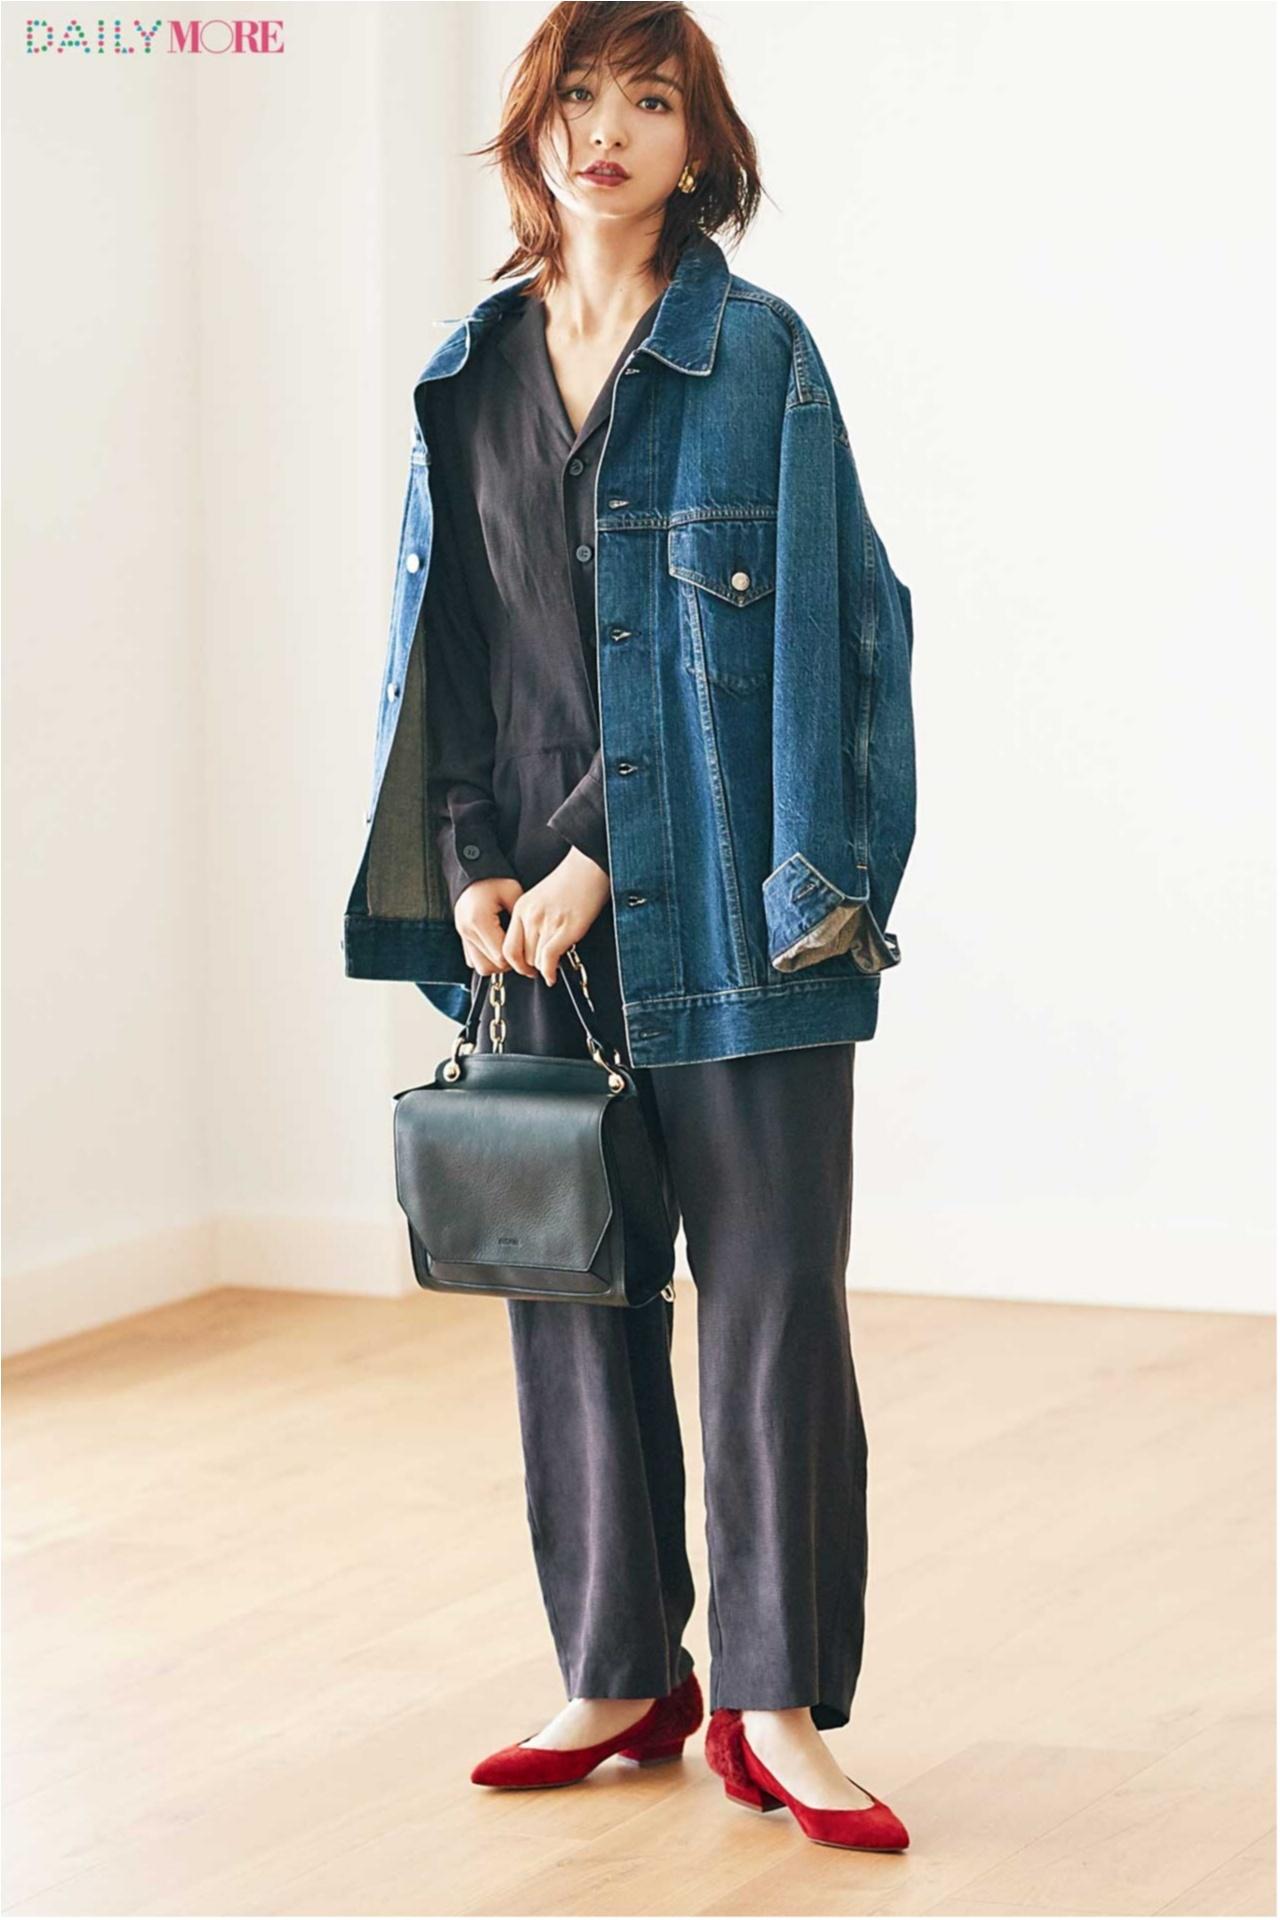 『ZARA』のベストバイ、リバーシブルスカート、4cmヒール靴が秋ファッションに欠かせない♡ 今週のファッション人気ランキングトップ5!_1_1